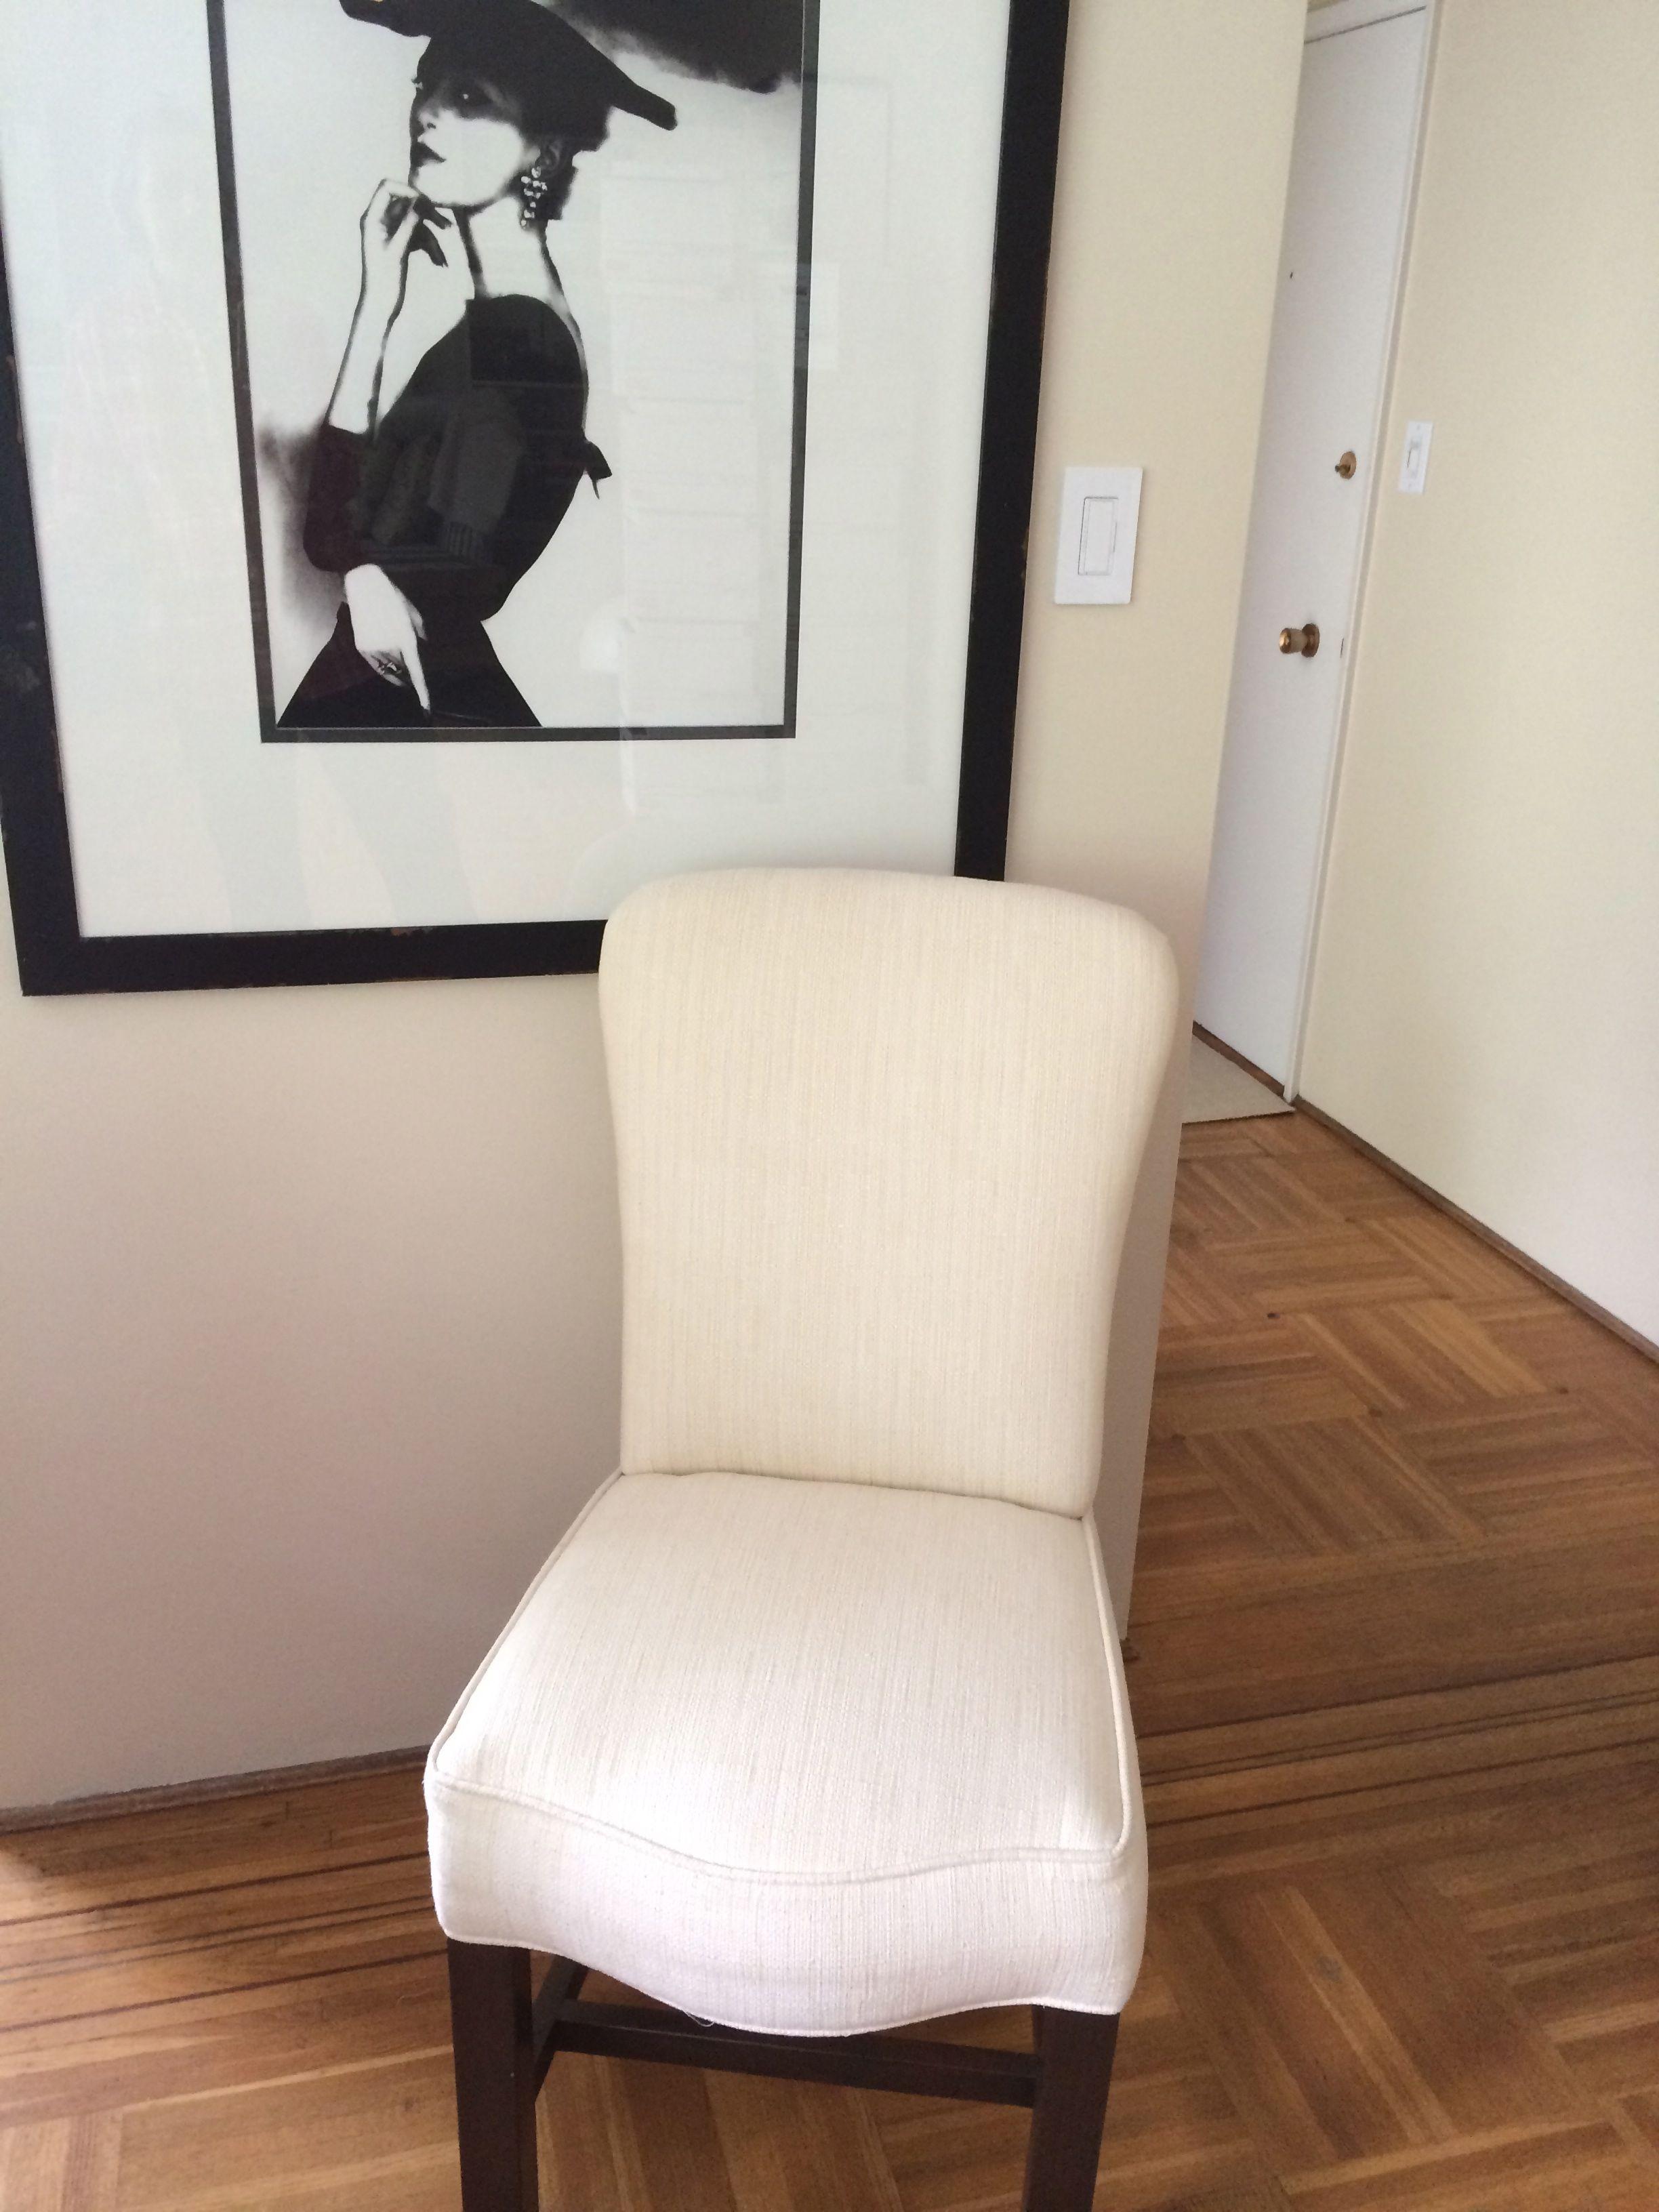 2014 . cream dining chair, floors, Bassman photograph